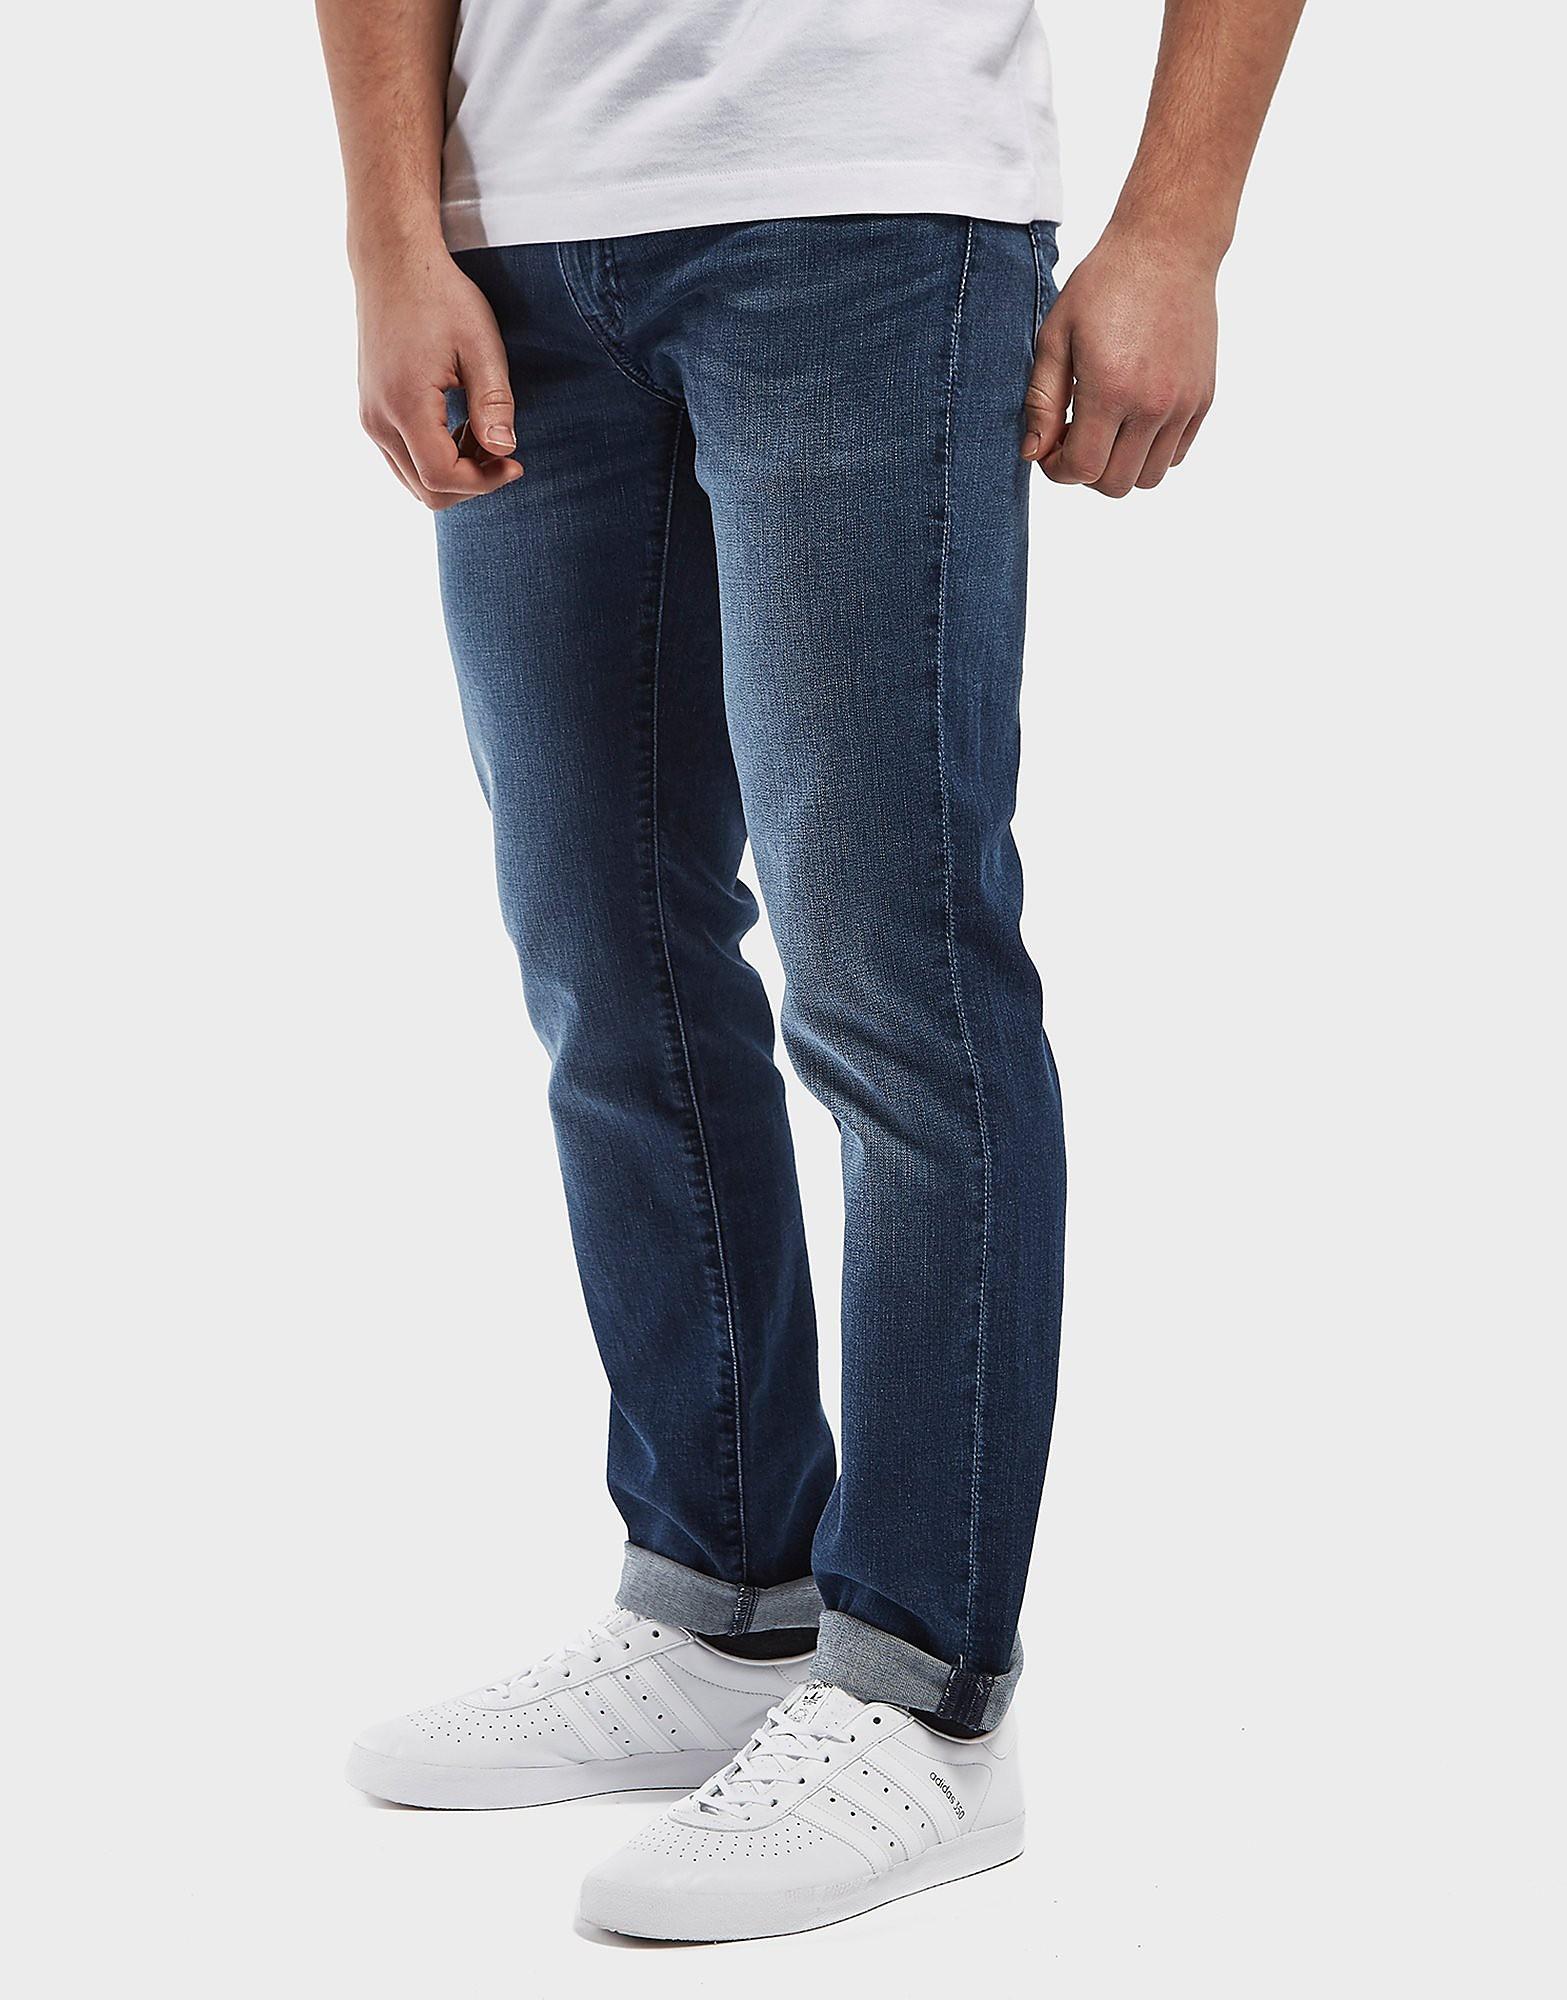 Levis 511 Slim Lightweight Jeans